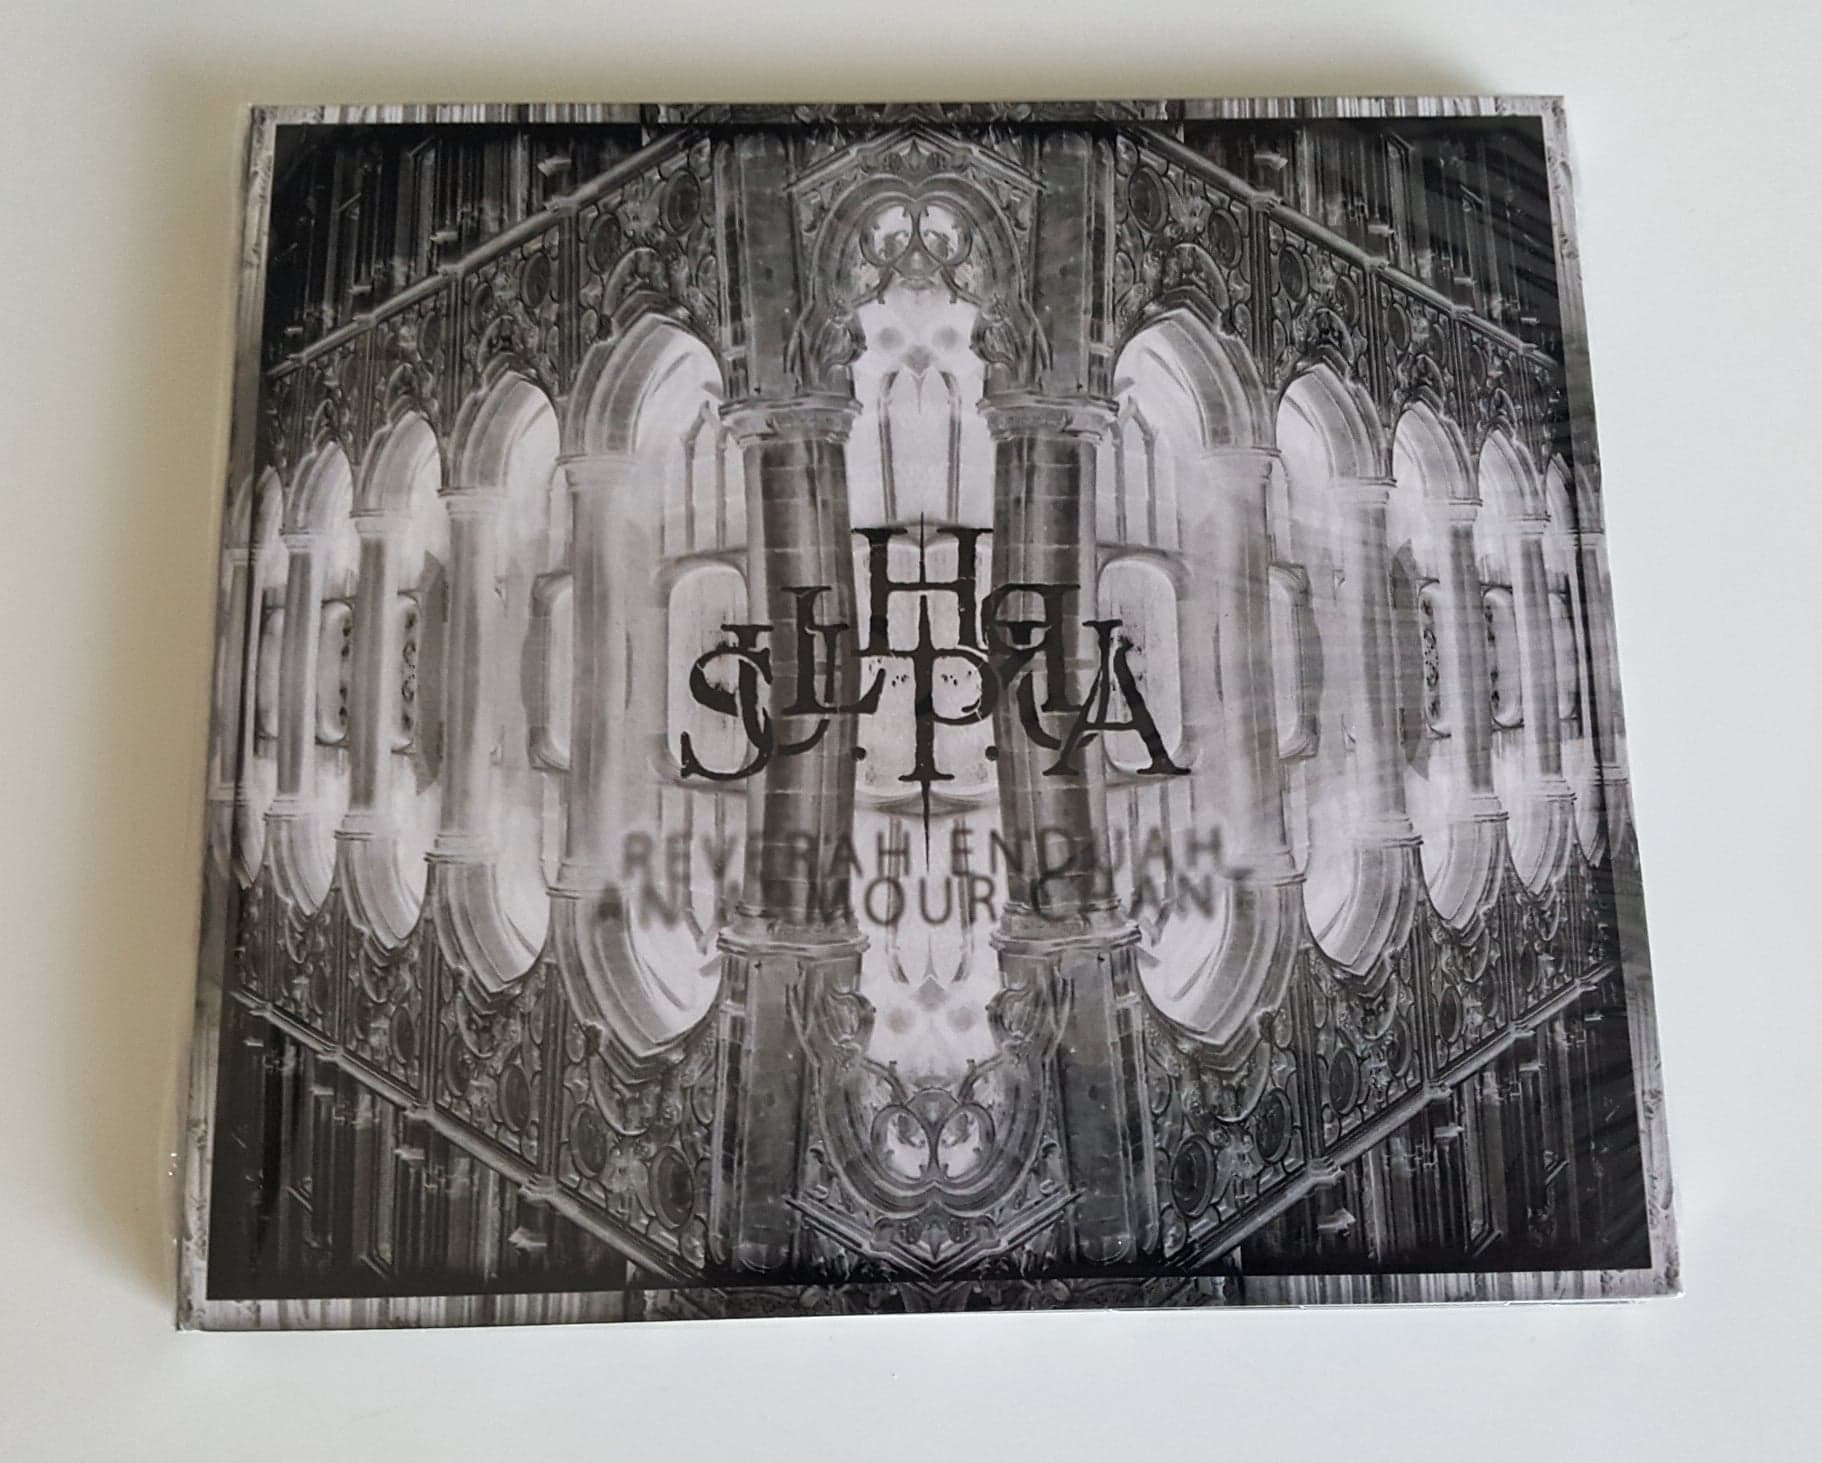 SULPHURA - Reverah Enduah-An Armour Chant CD